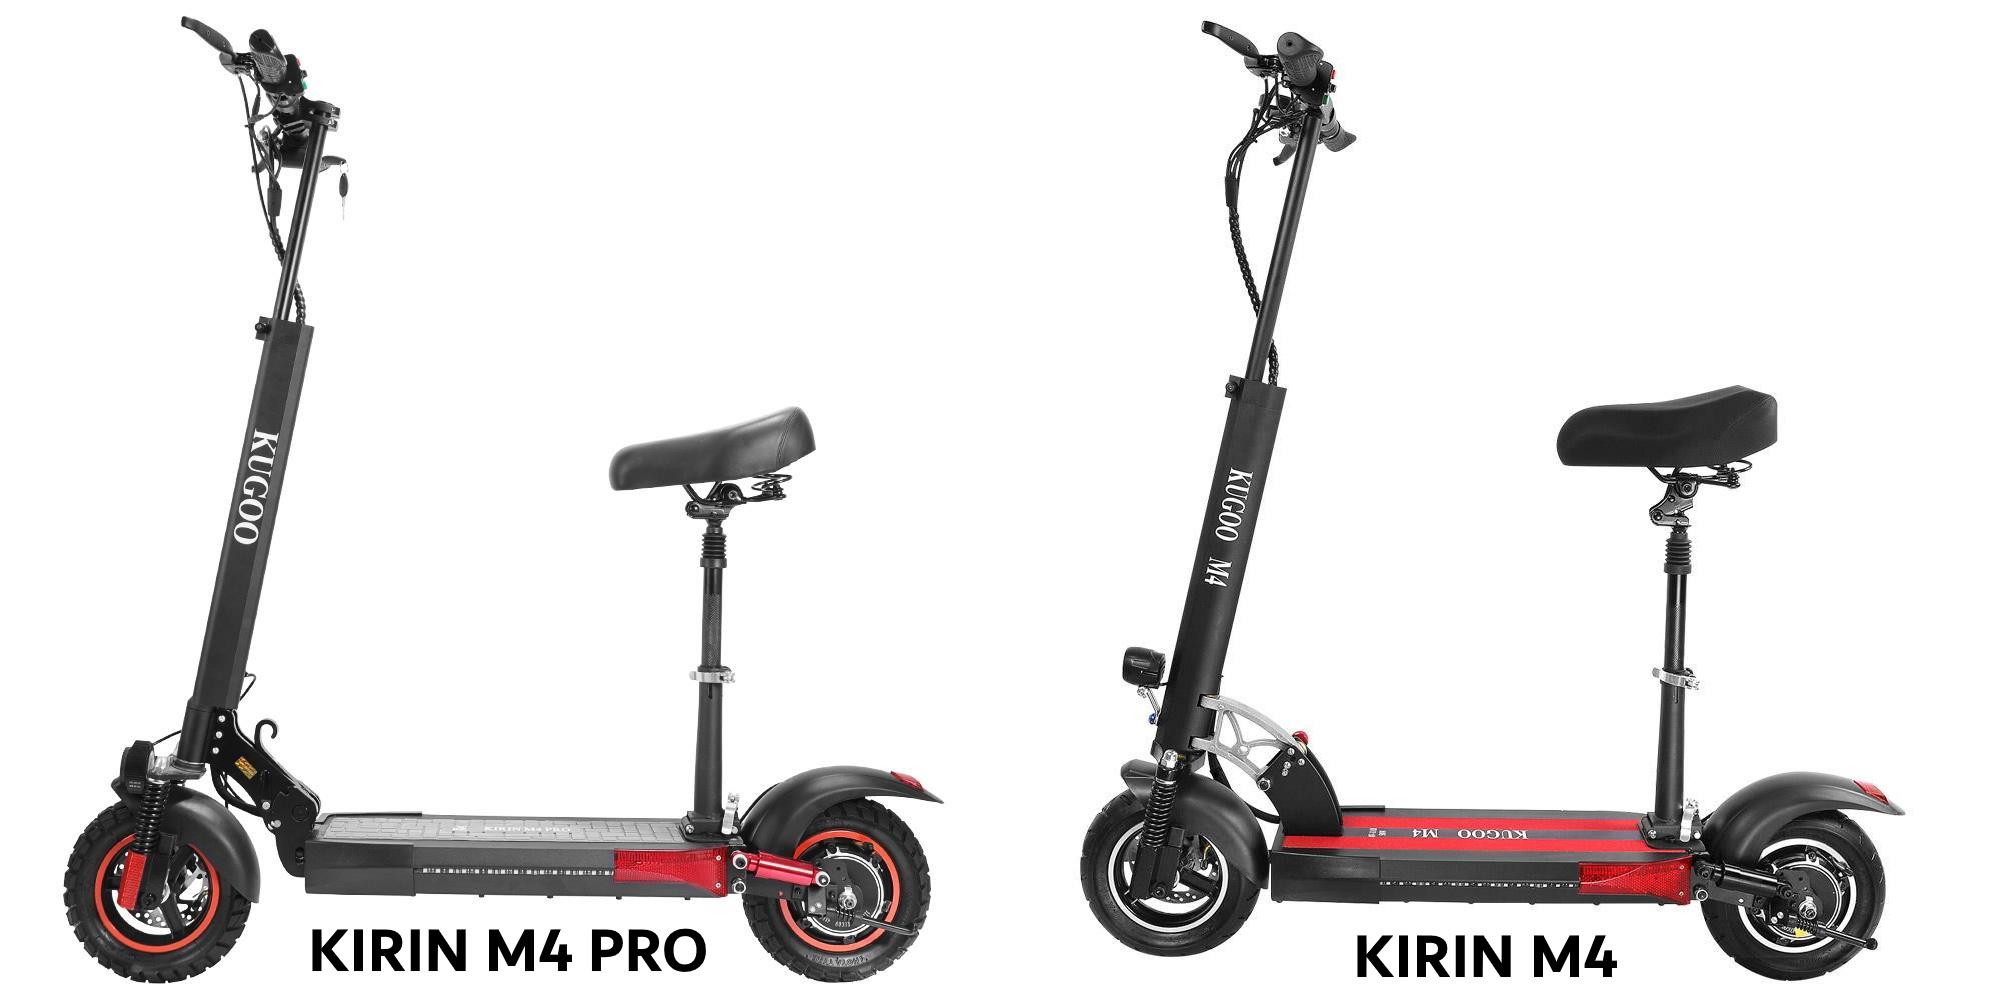 KUGOO KIRIN M4 vs M4 Pro